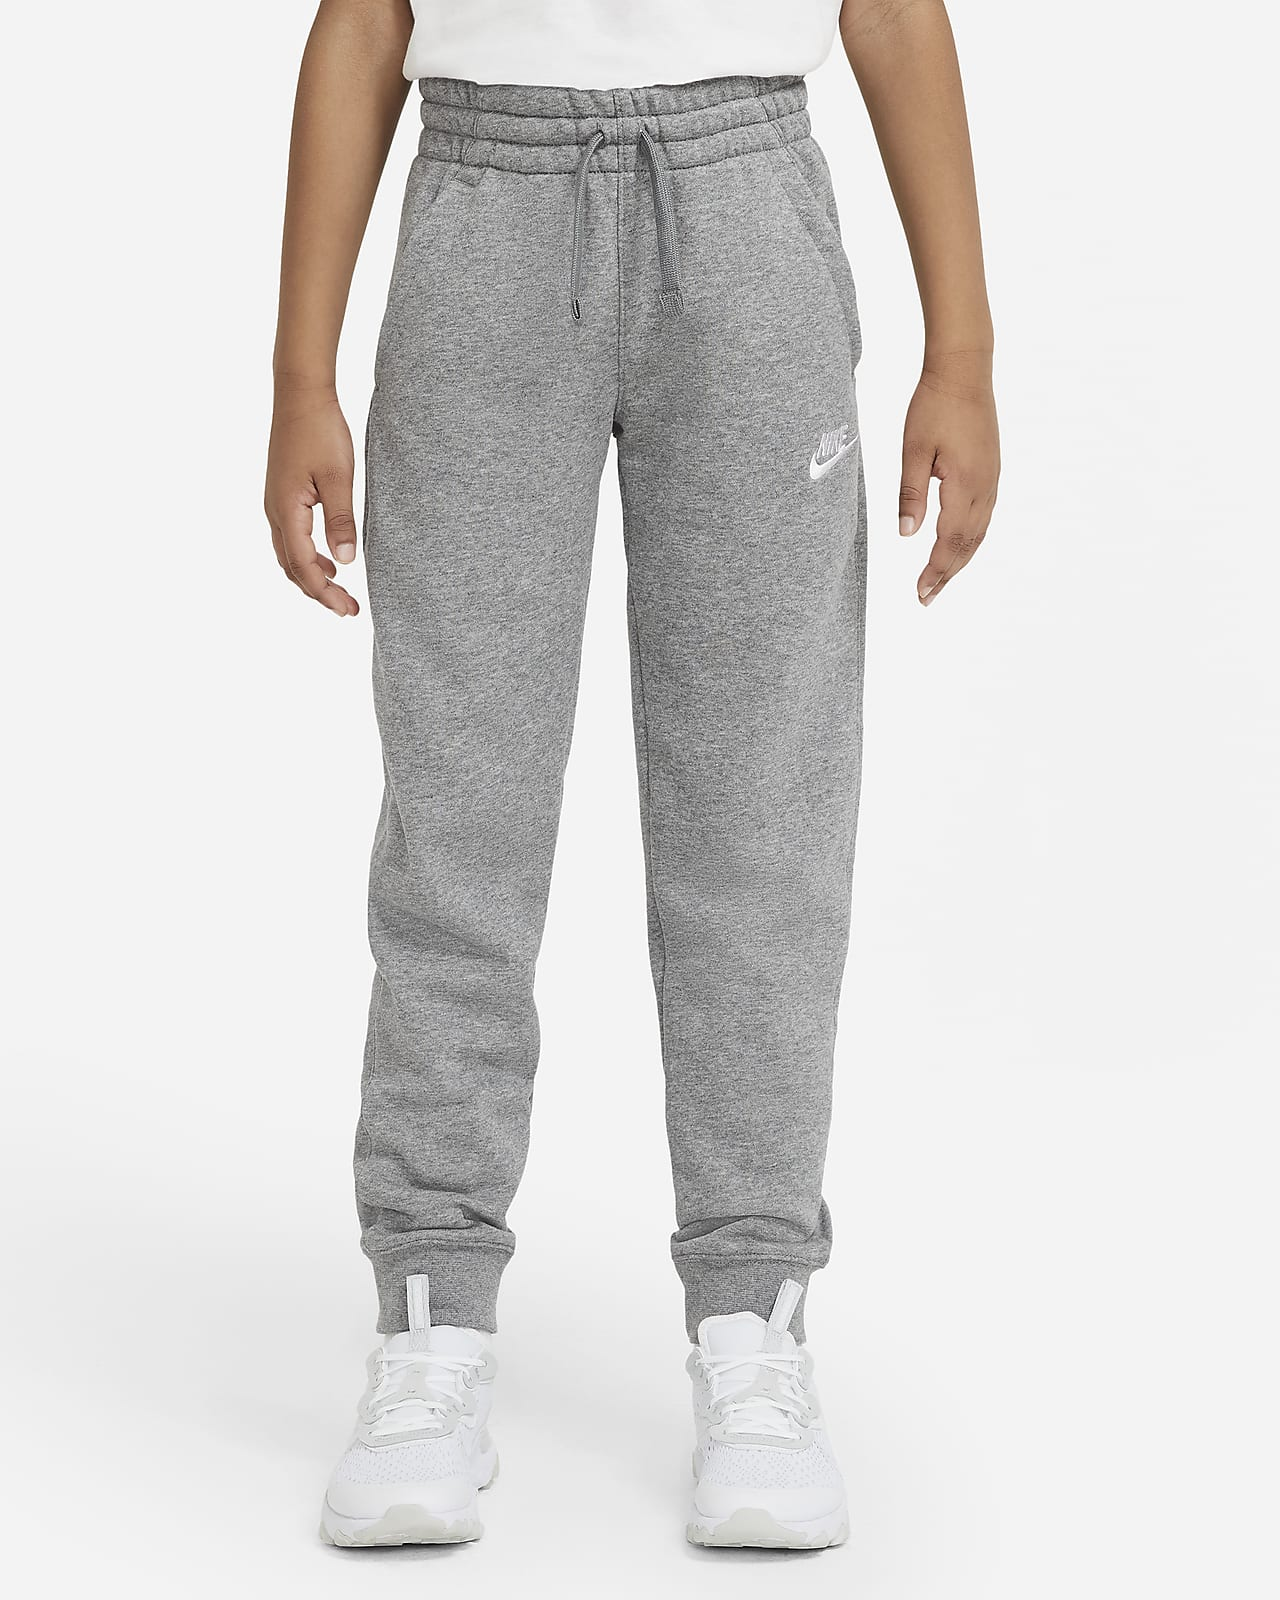 Nike Sportswear Club Pantalón de tejido French terry - Niño